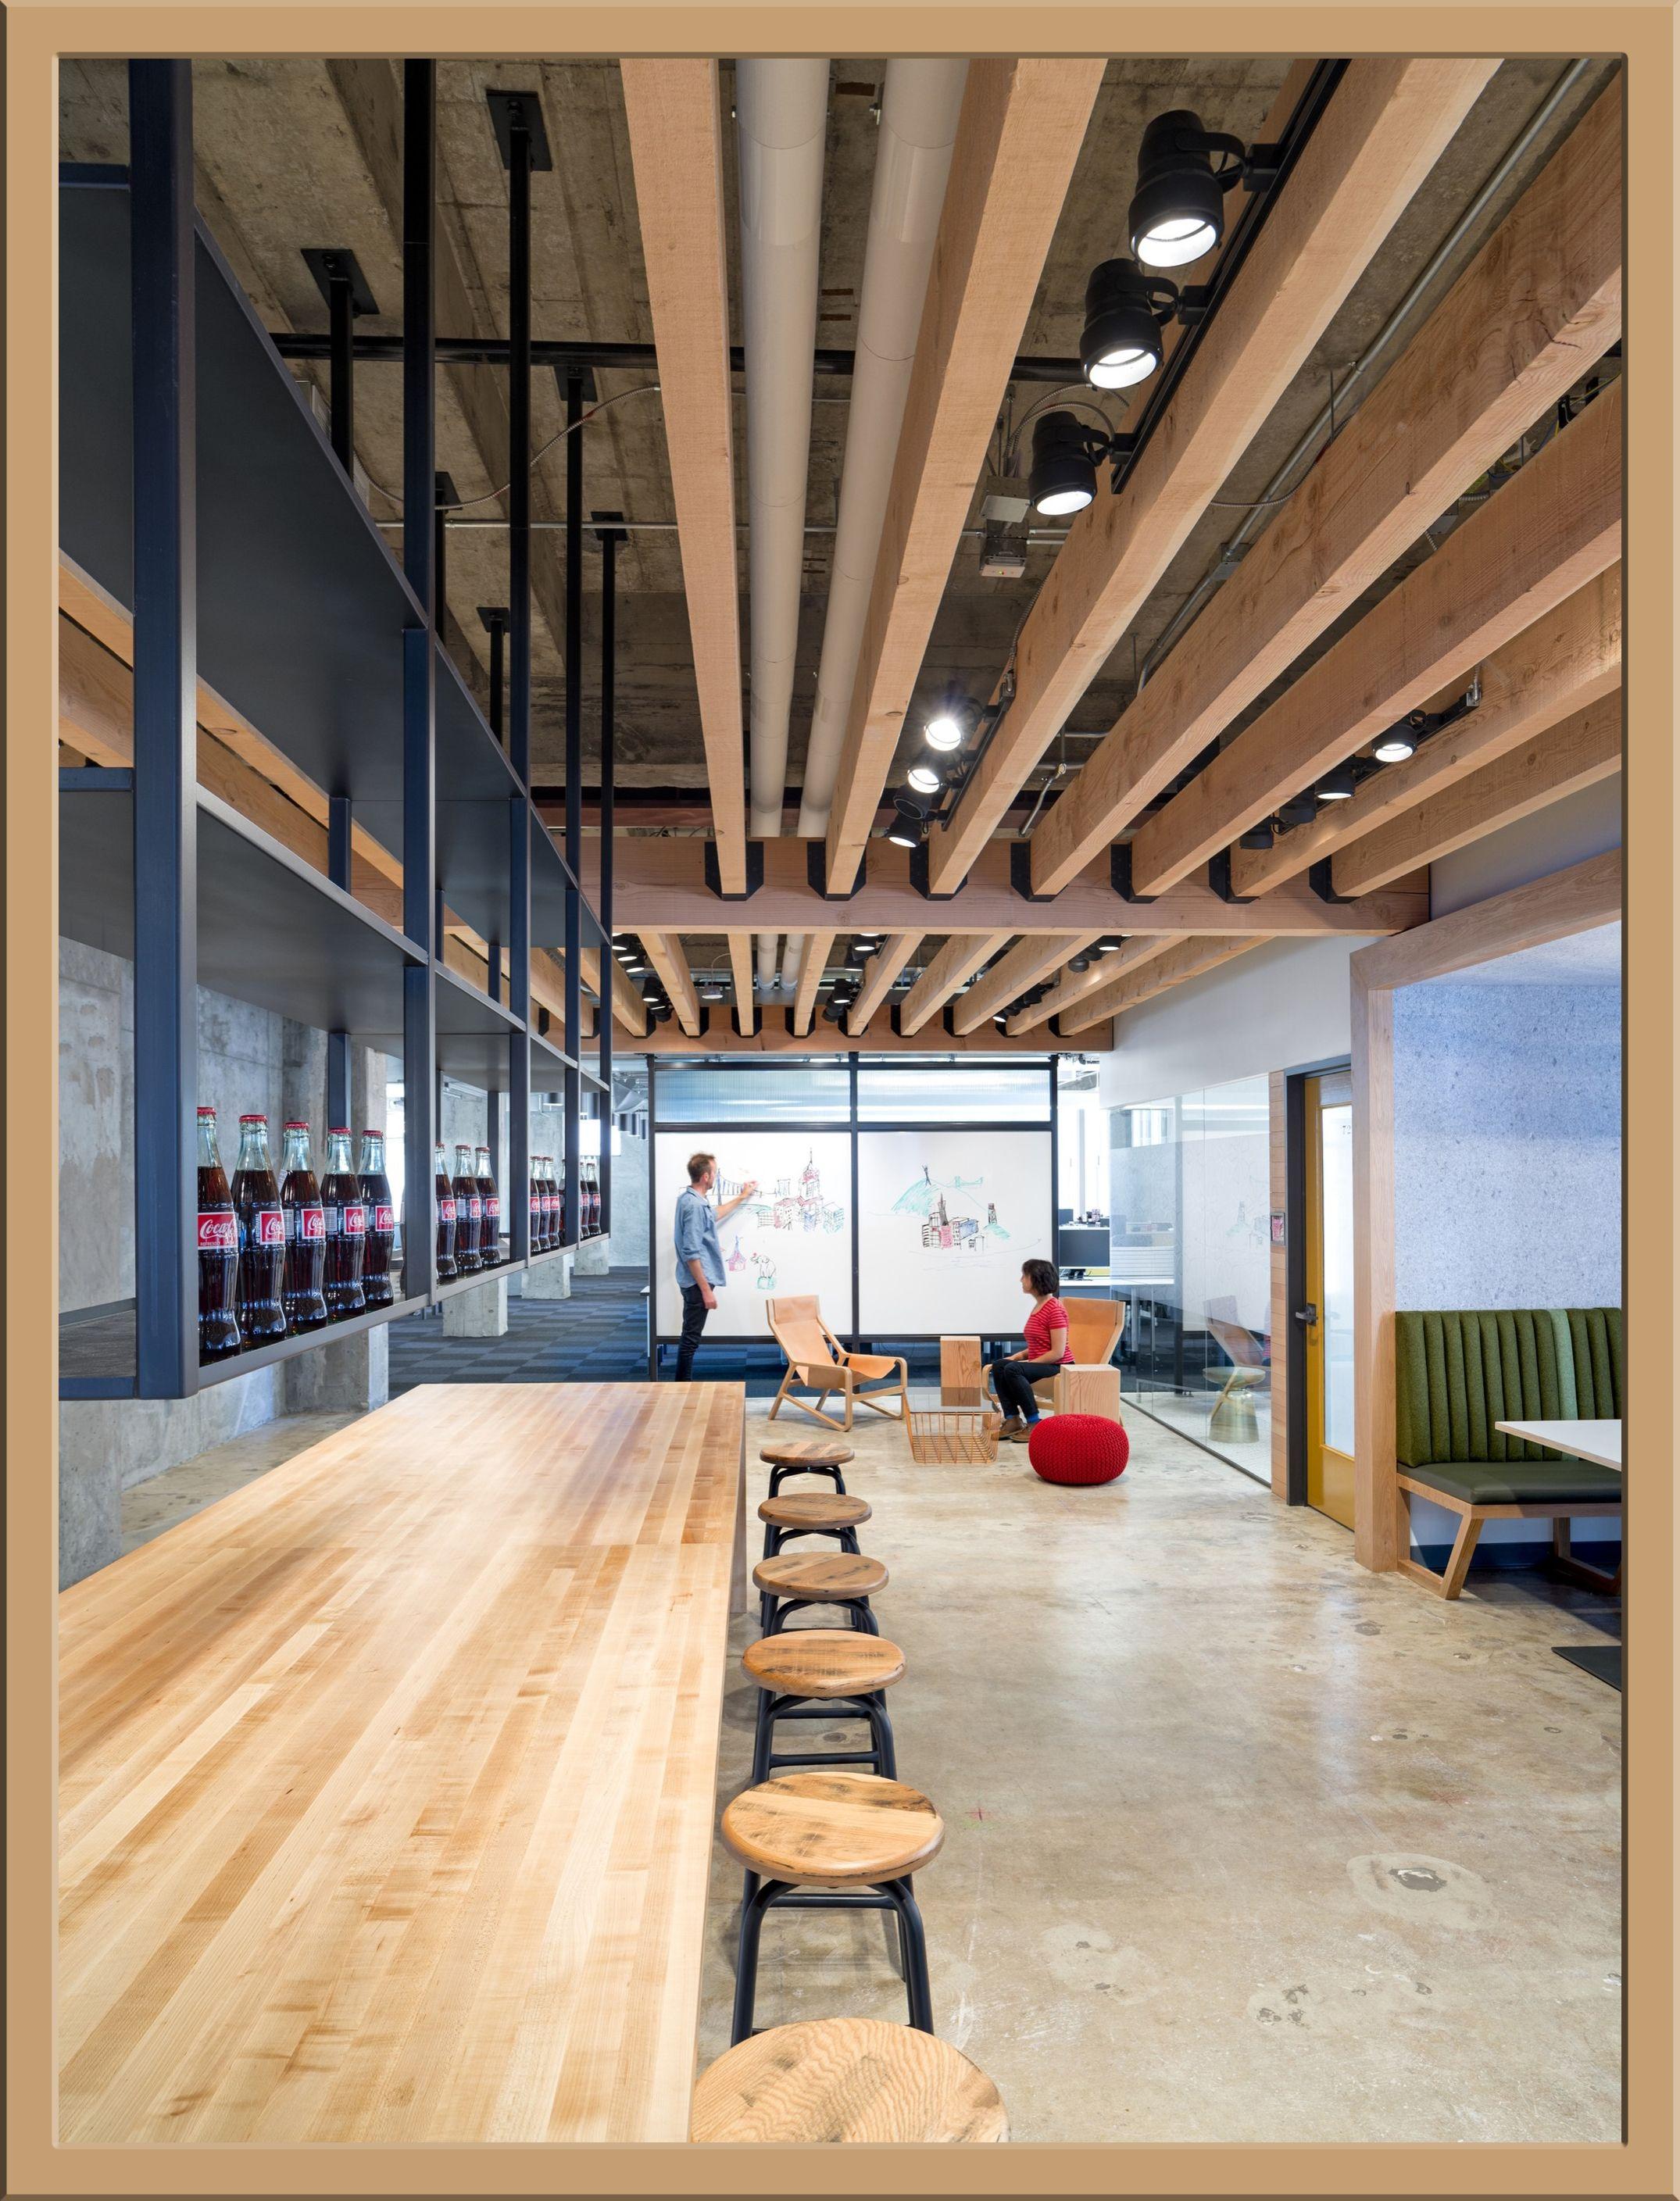 21 New Age Ways To Interior Design